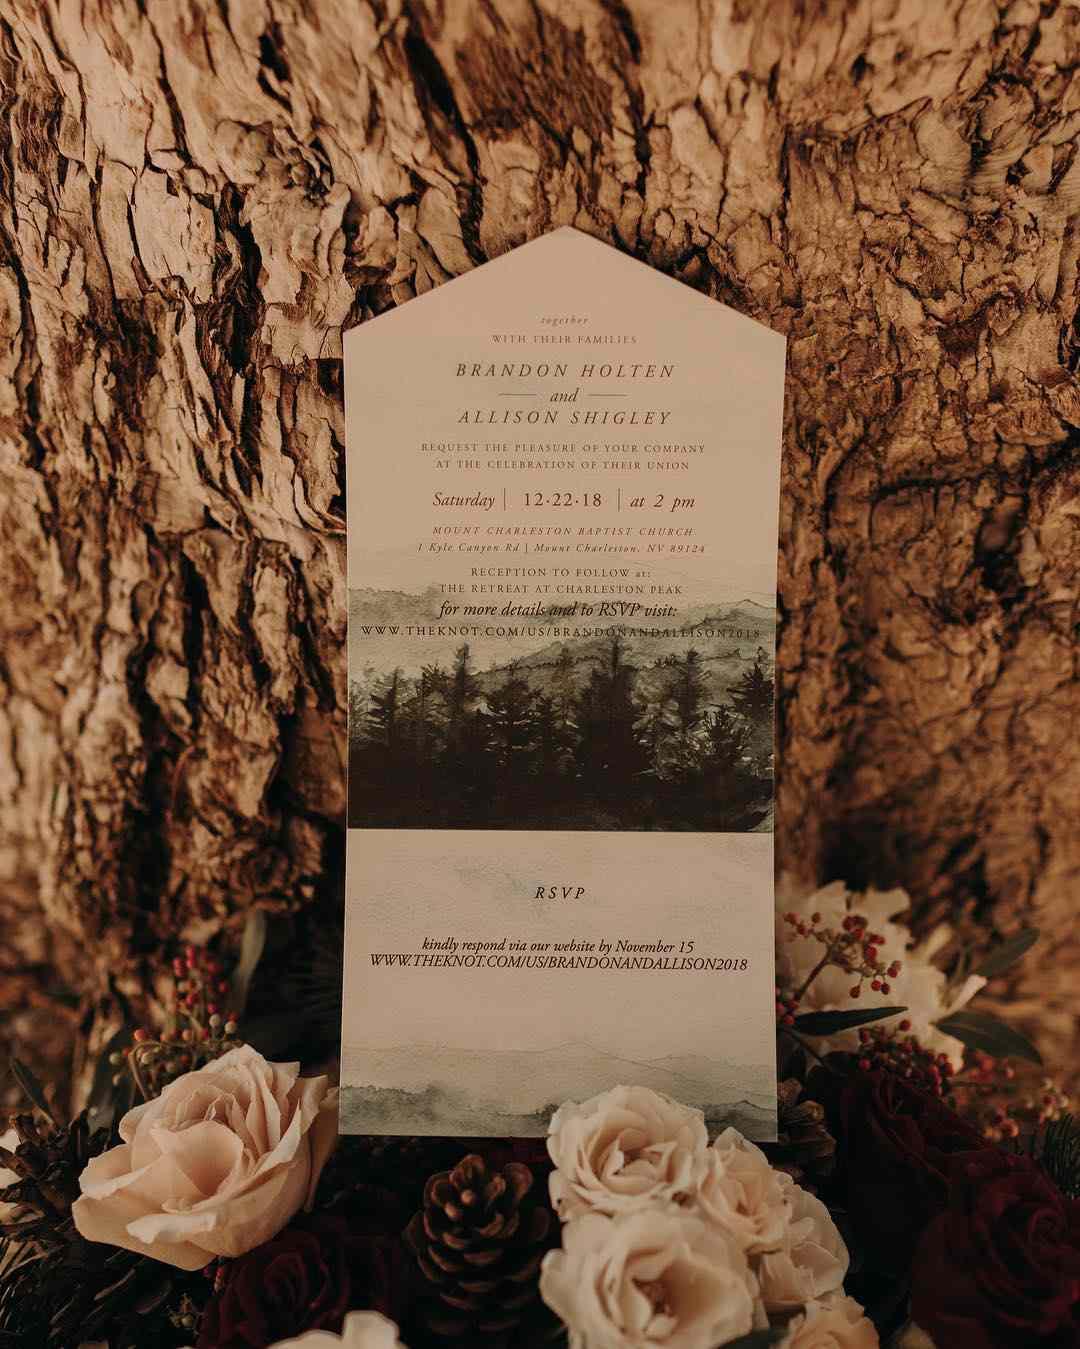 earth-inspired invitation